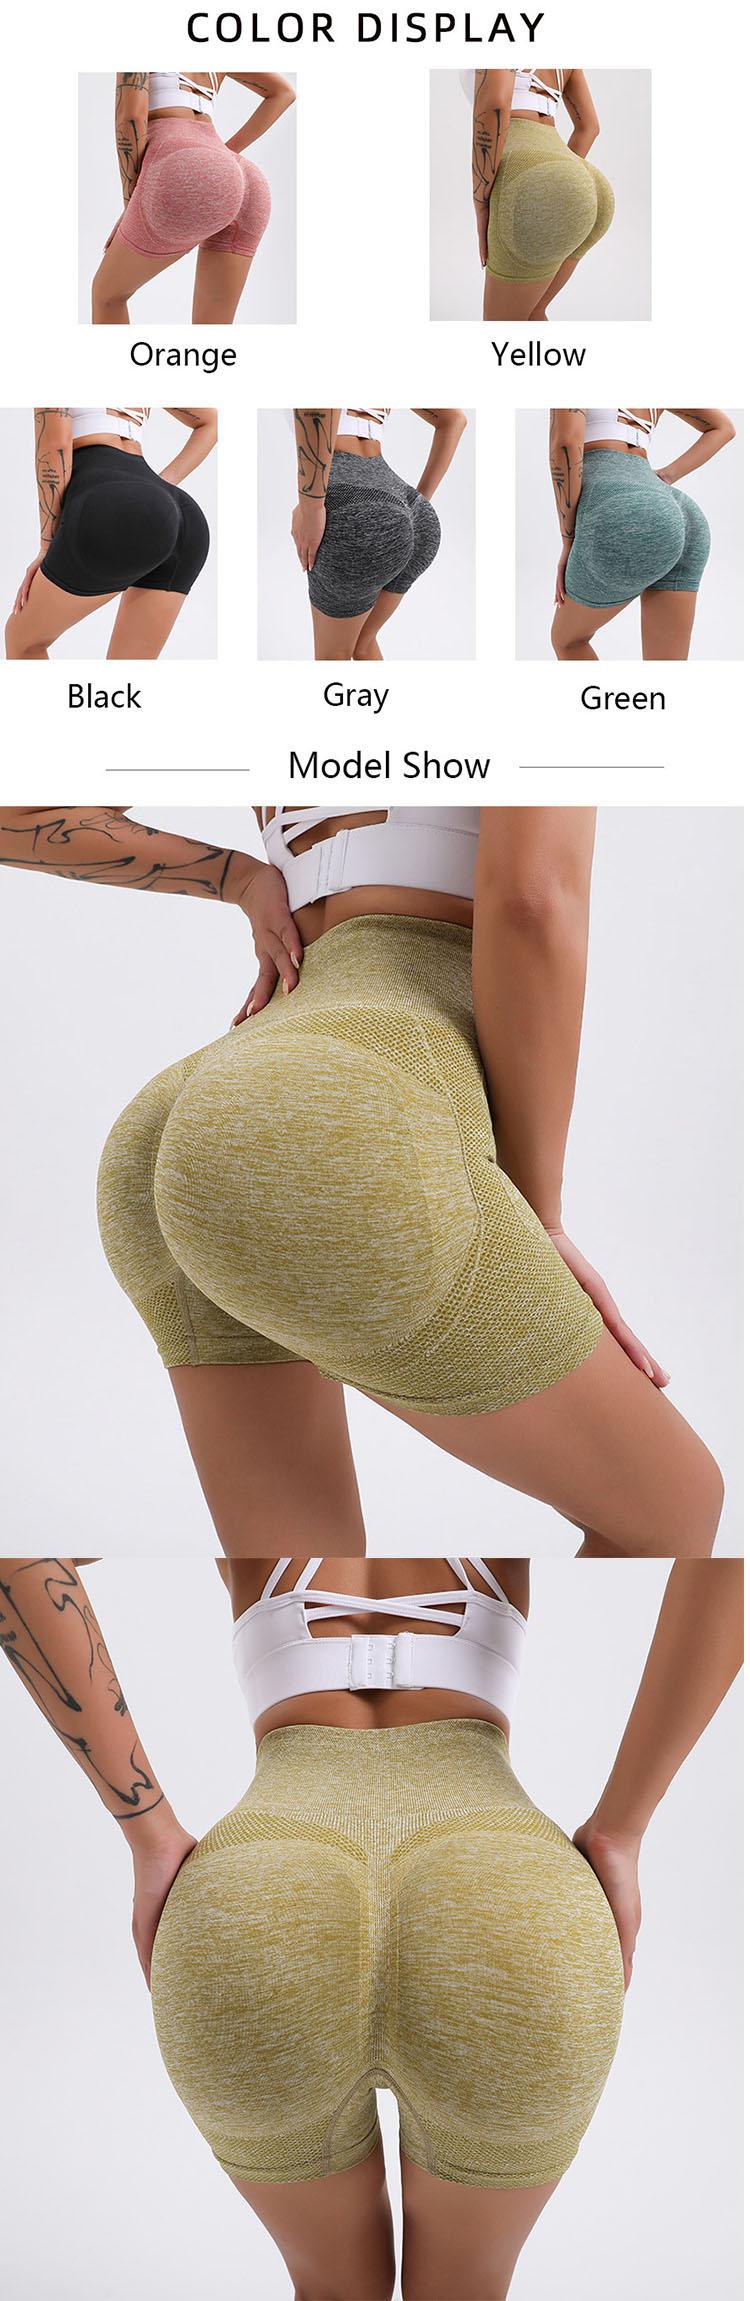 High waist design, close to the skin, tight waist.